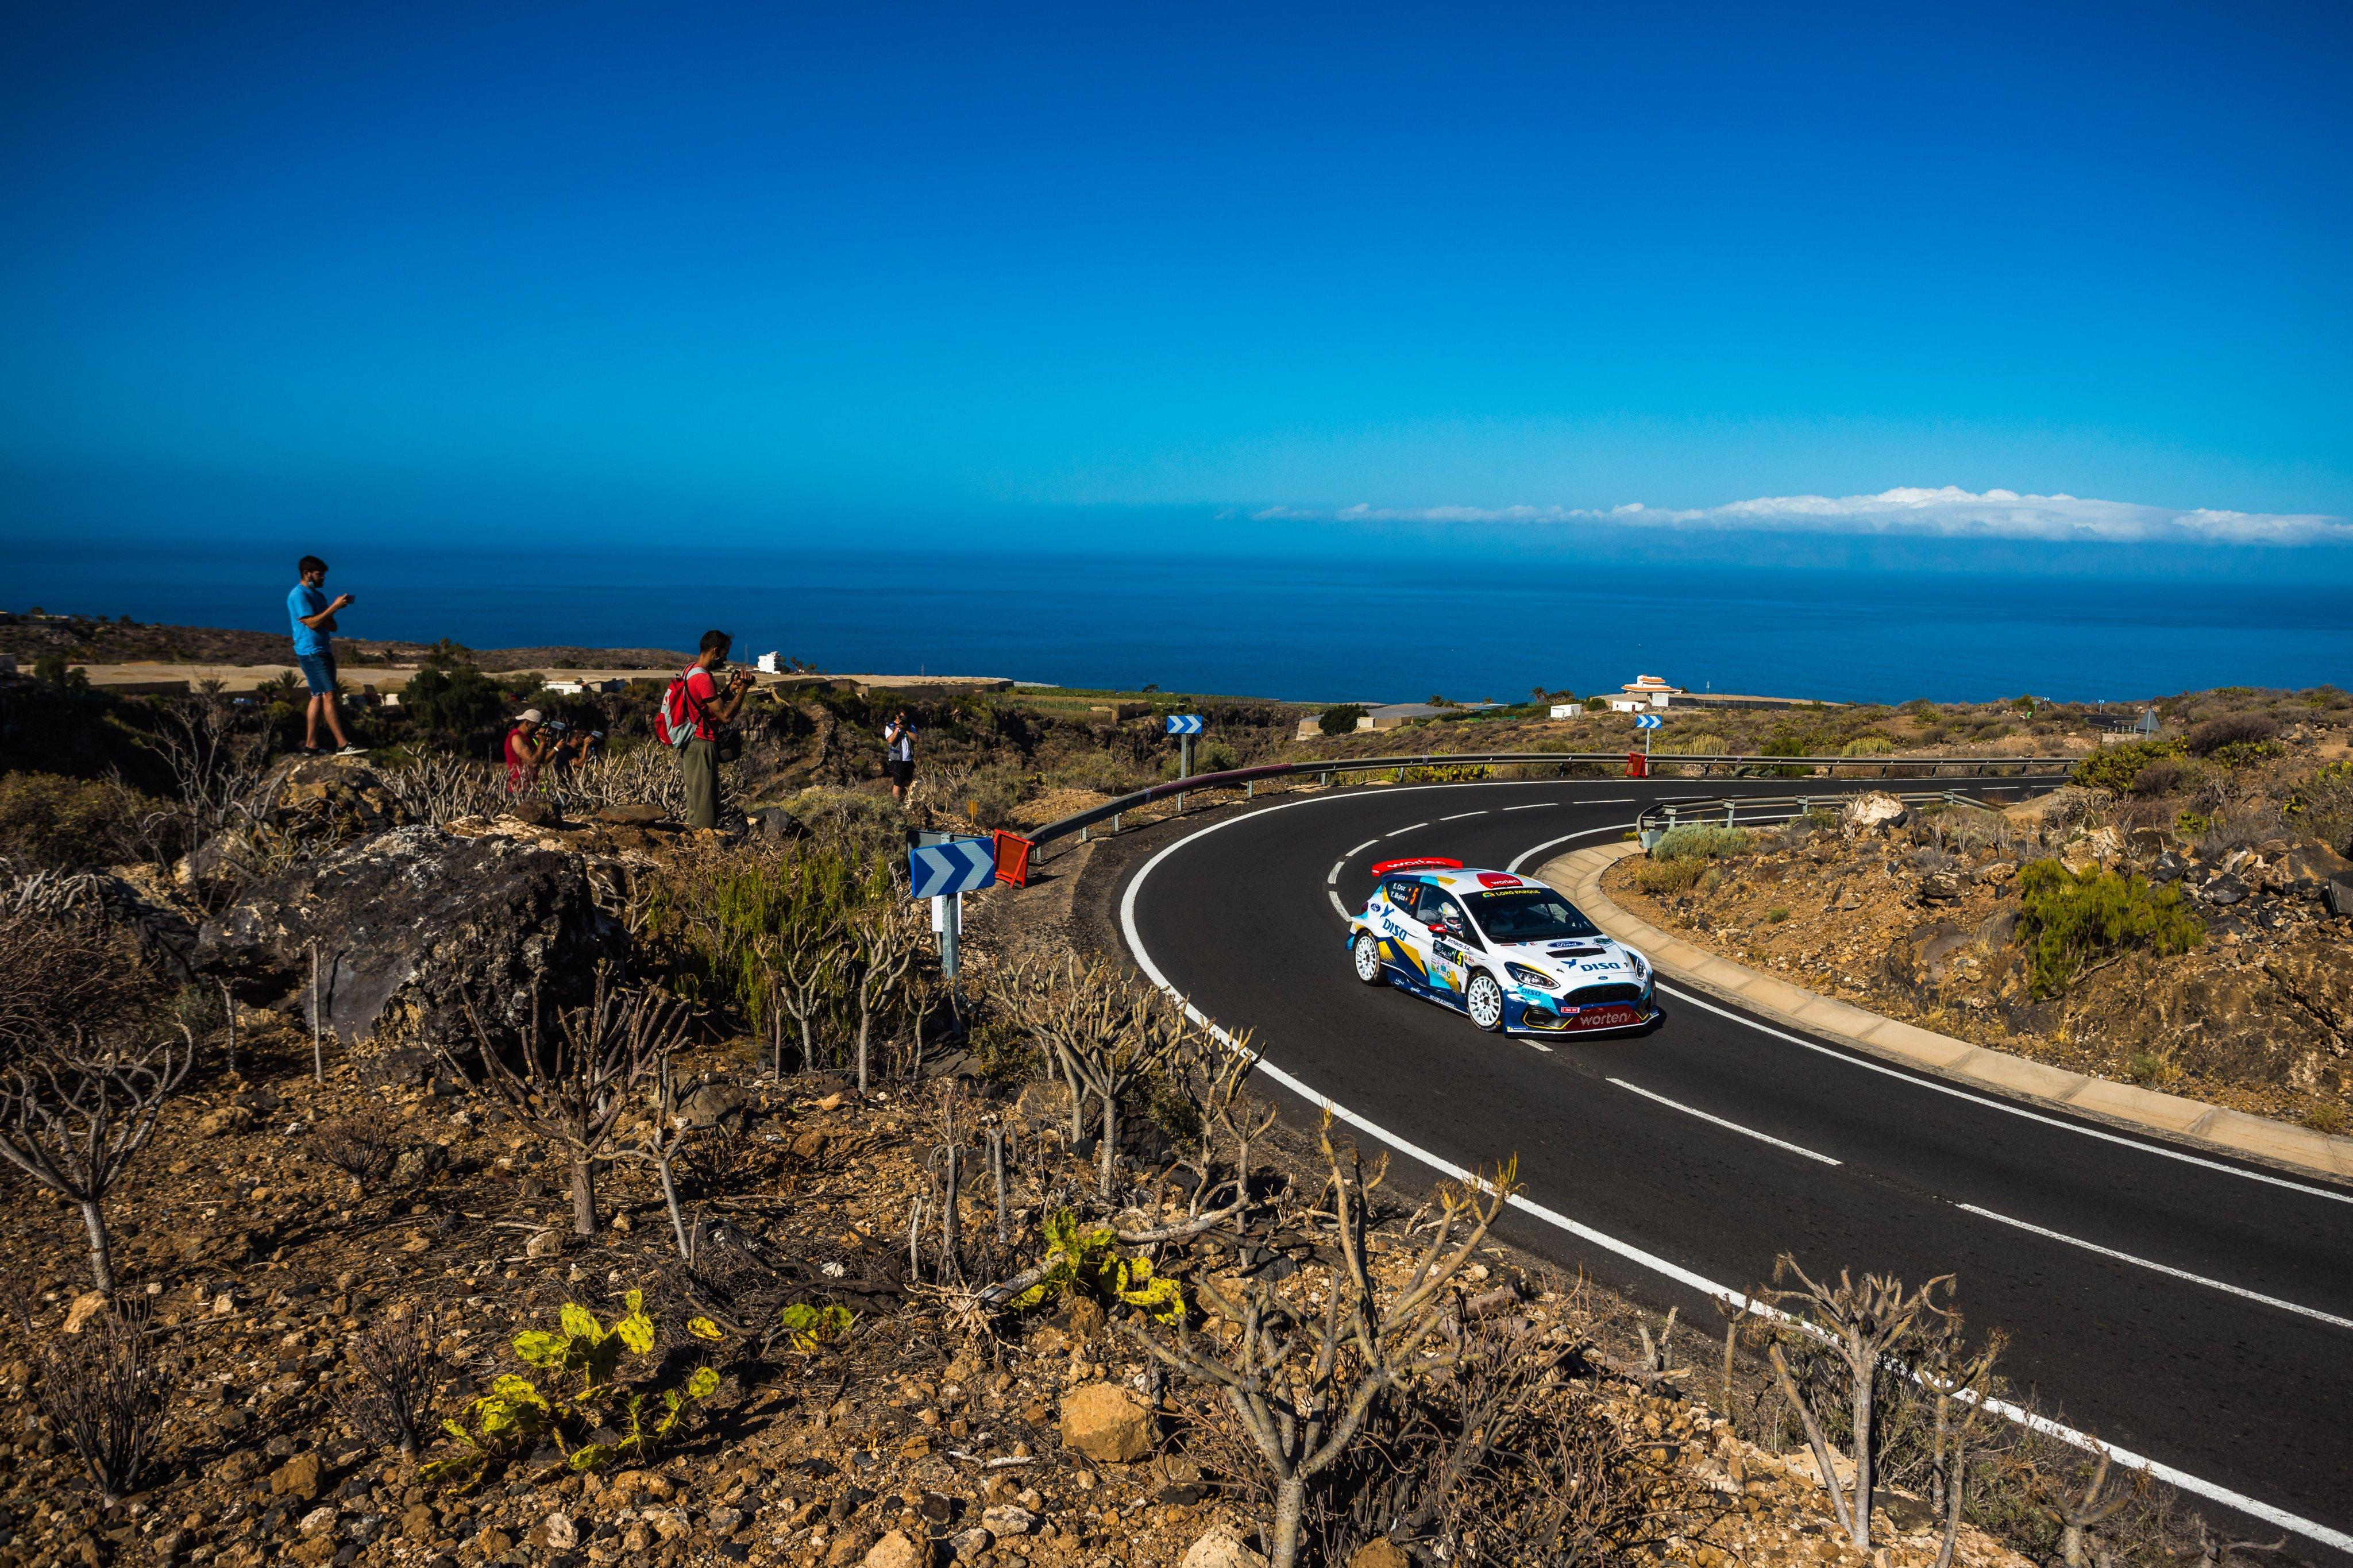 SCER: 30º Rallye Villa de Adeje BP Tenerife - Trofeo Cicar [13-15 Mayo] - Página 2 E1XZUXXXEAQkyhR?format=jpg&name=4096x4096